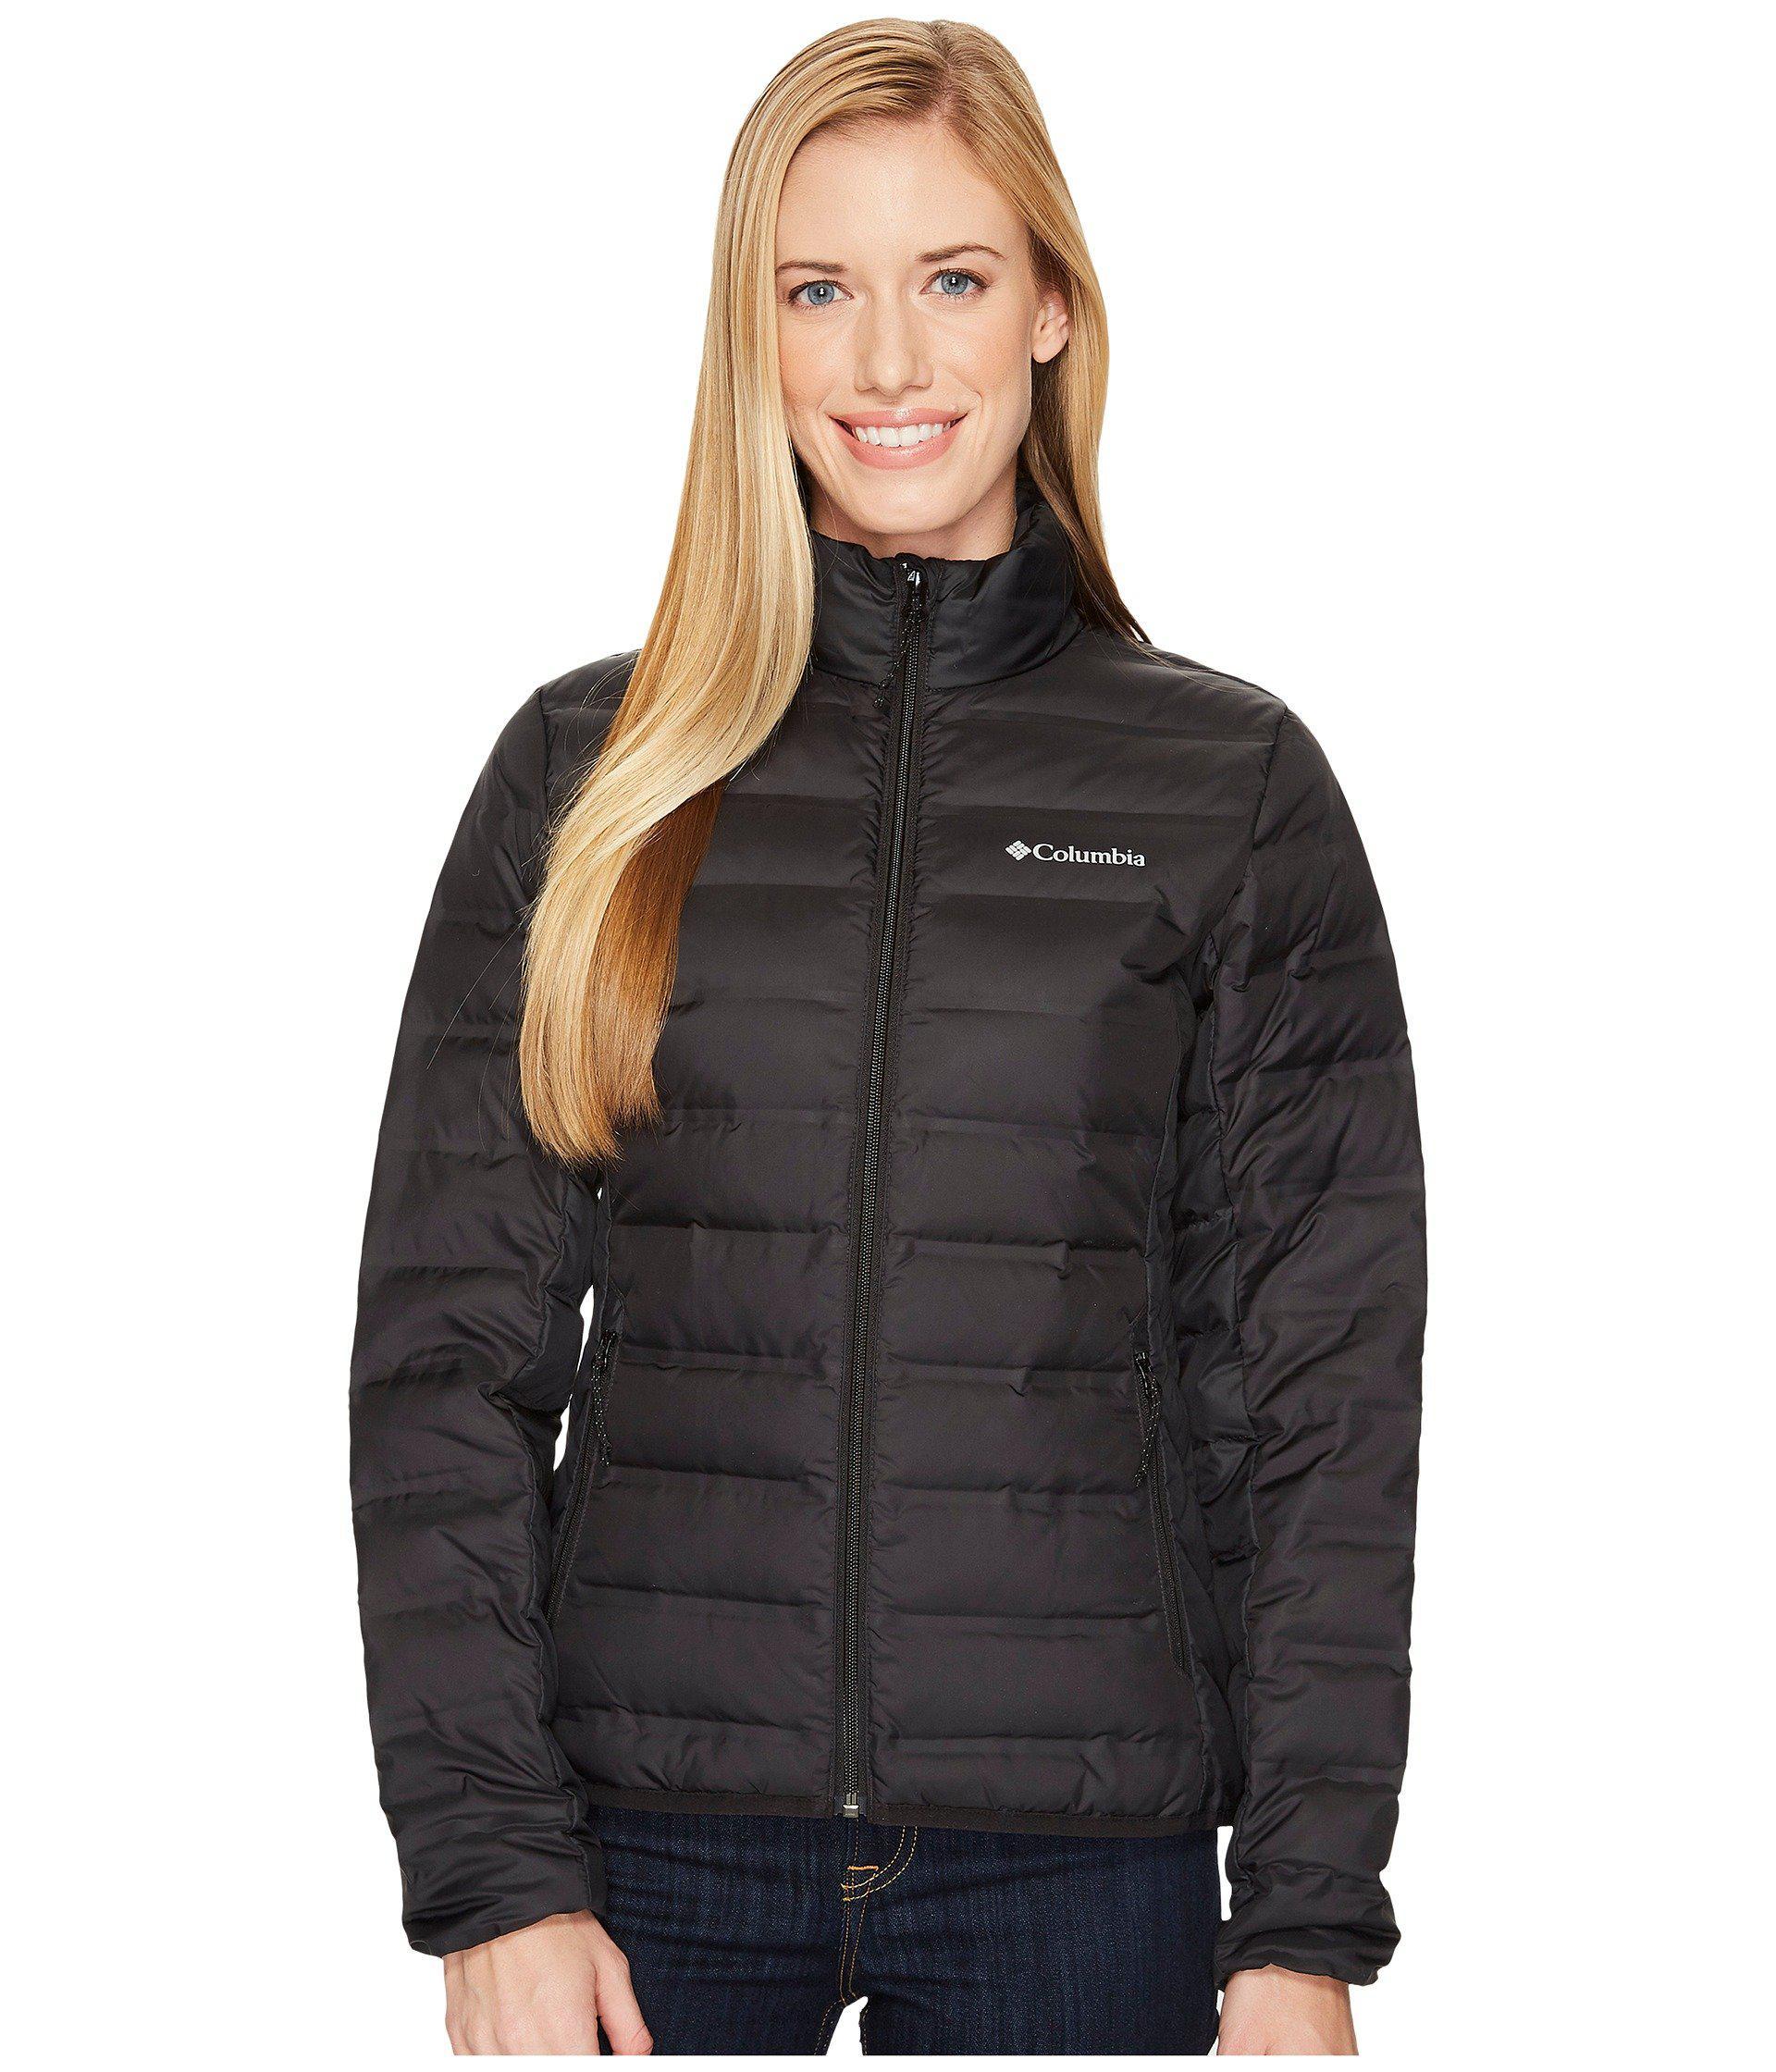 Lyst - Columbia Lake 22 Jacket (dark Plum) Women s Coat in Black 93039292efe1